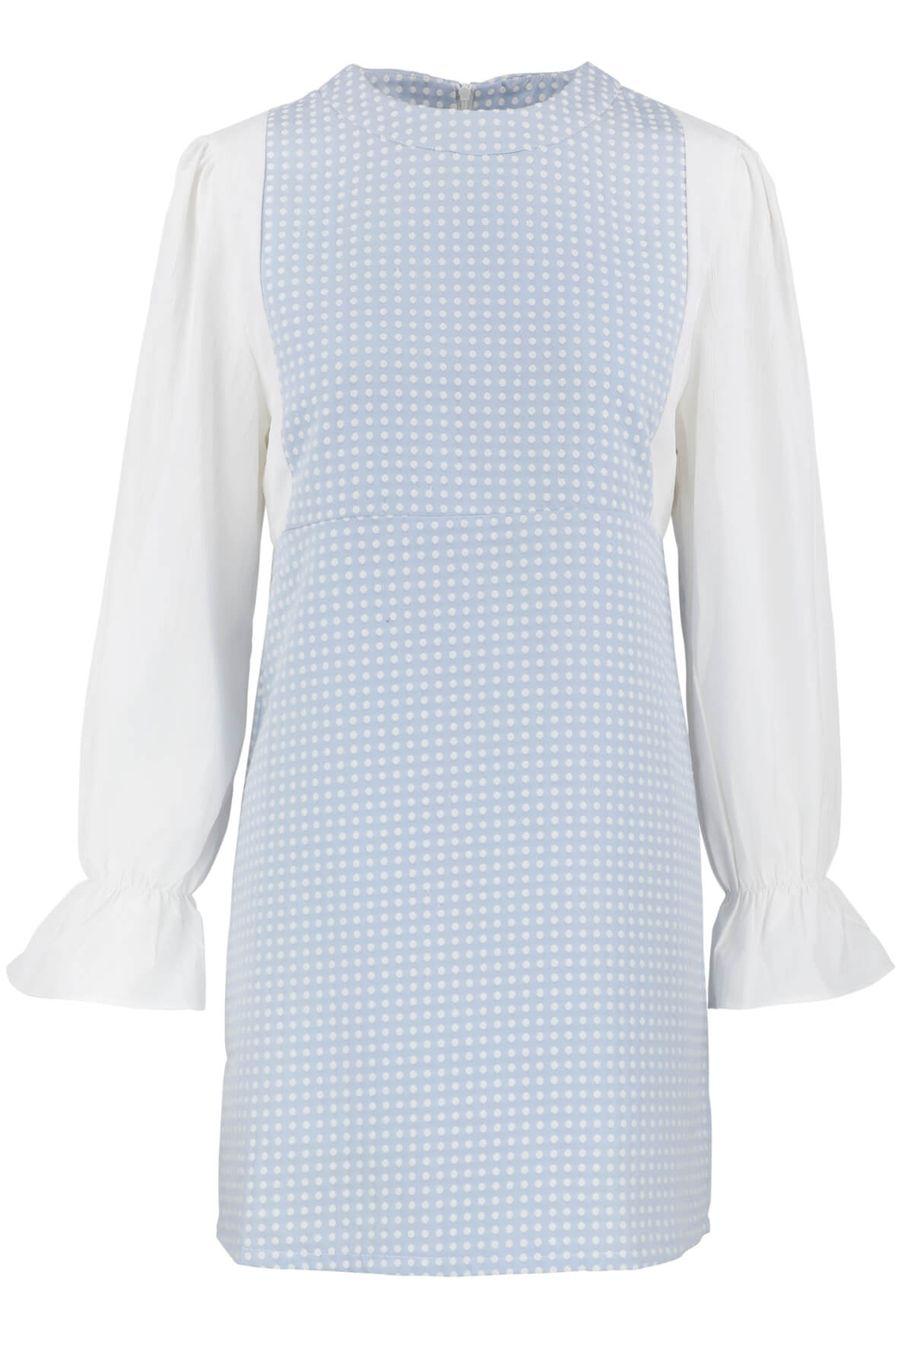 sister-jane-simple-math-pinafore-dress-1